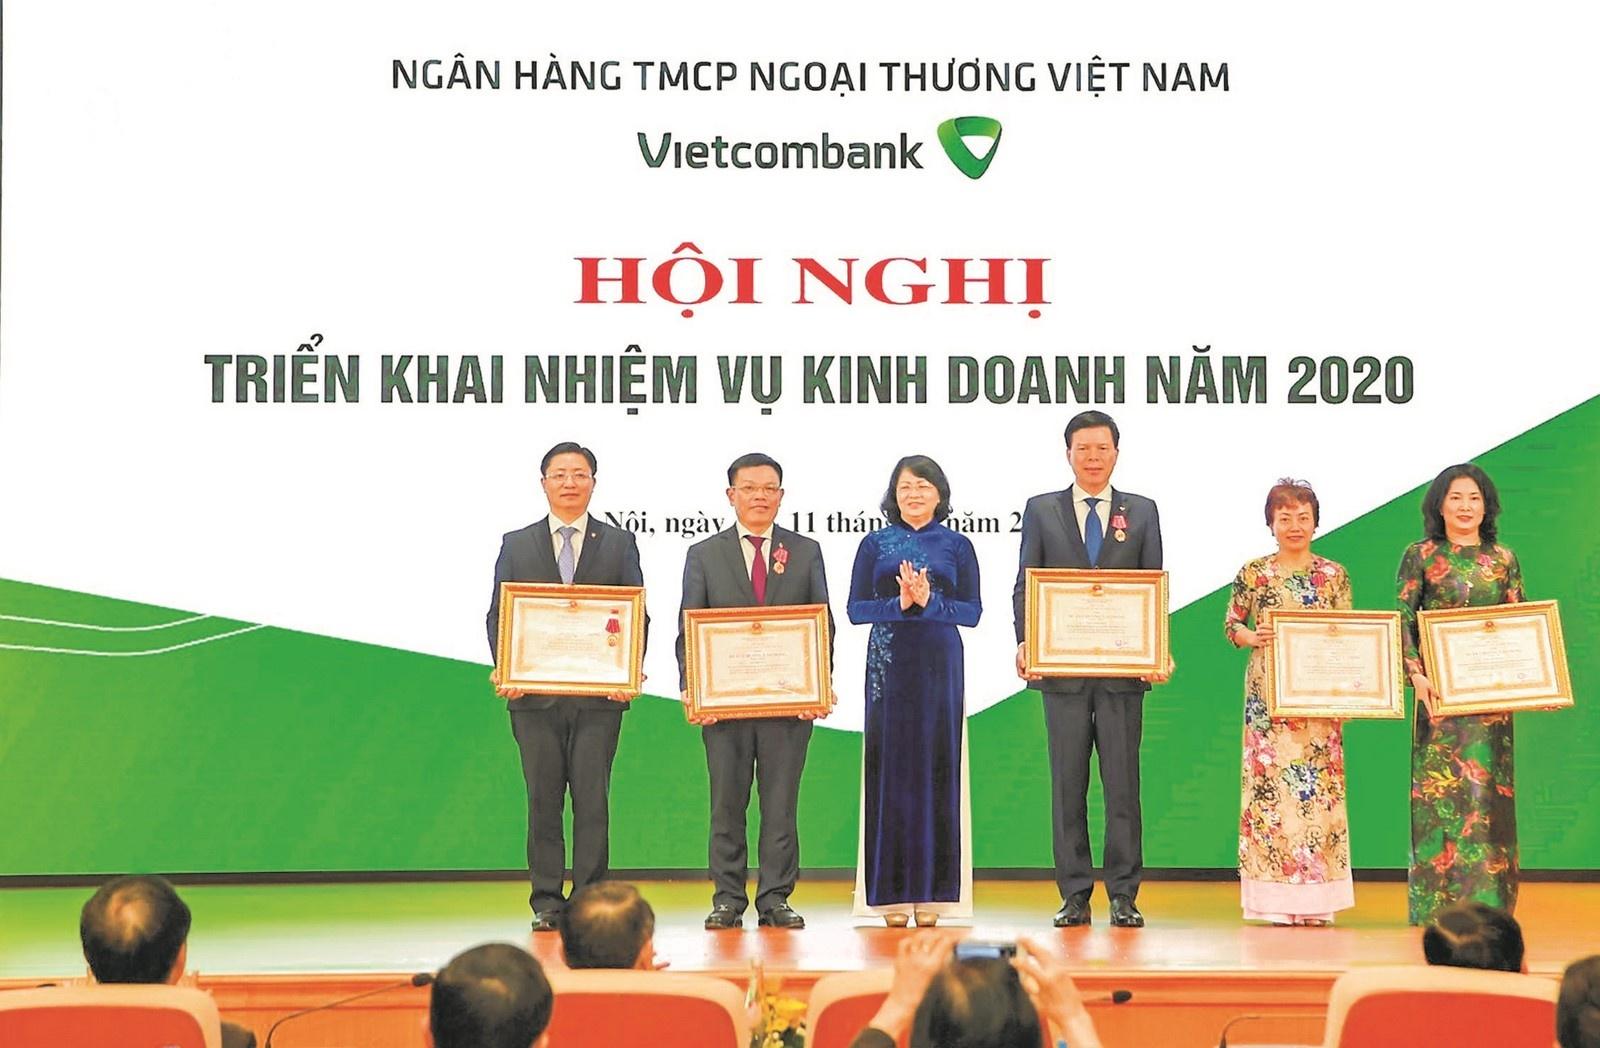 nguoi thu linh khoi win lam theo loi bac